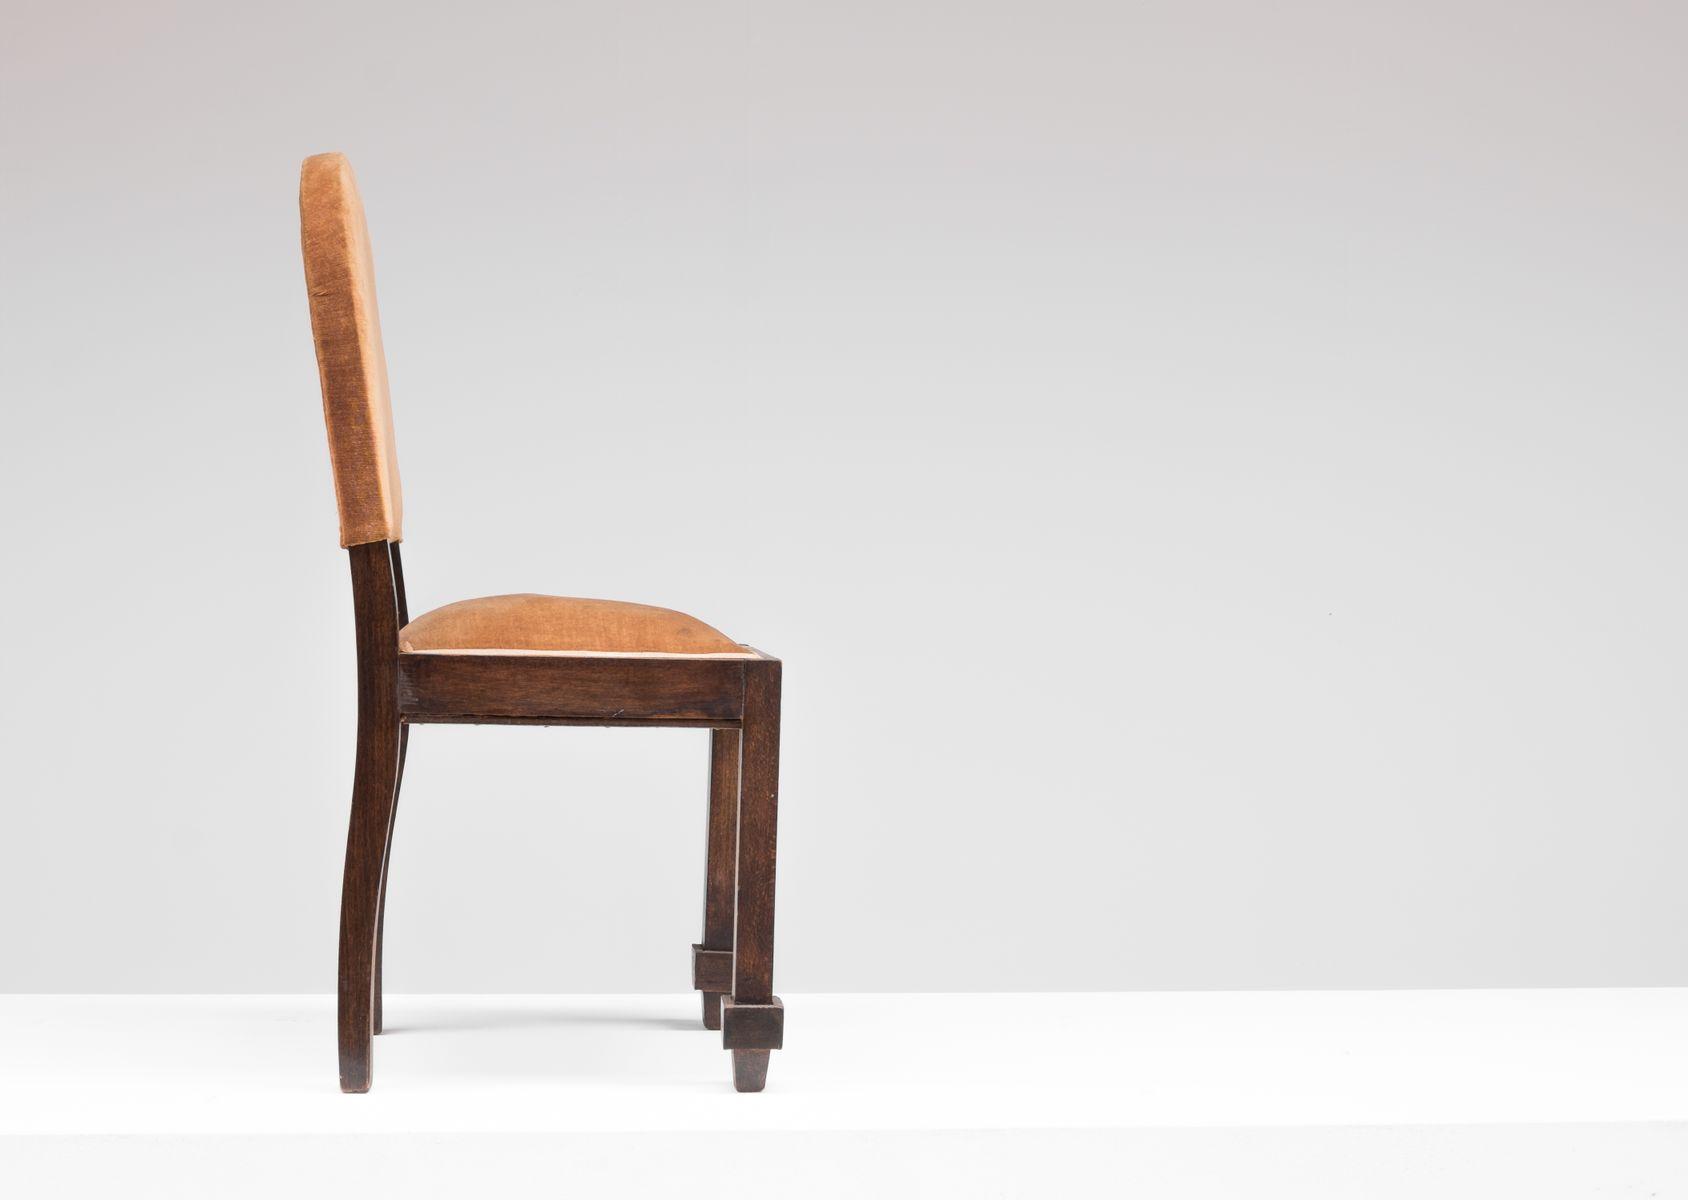 art deco stuhl von de coene bei pamono kaufen. Black Bedroom Furniture Sets. Home Design Ideas